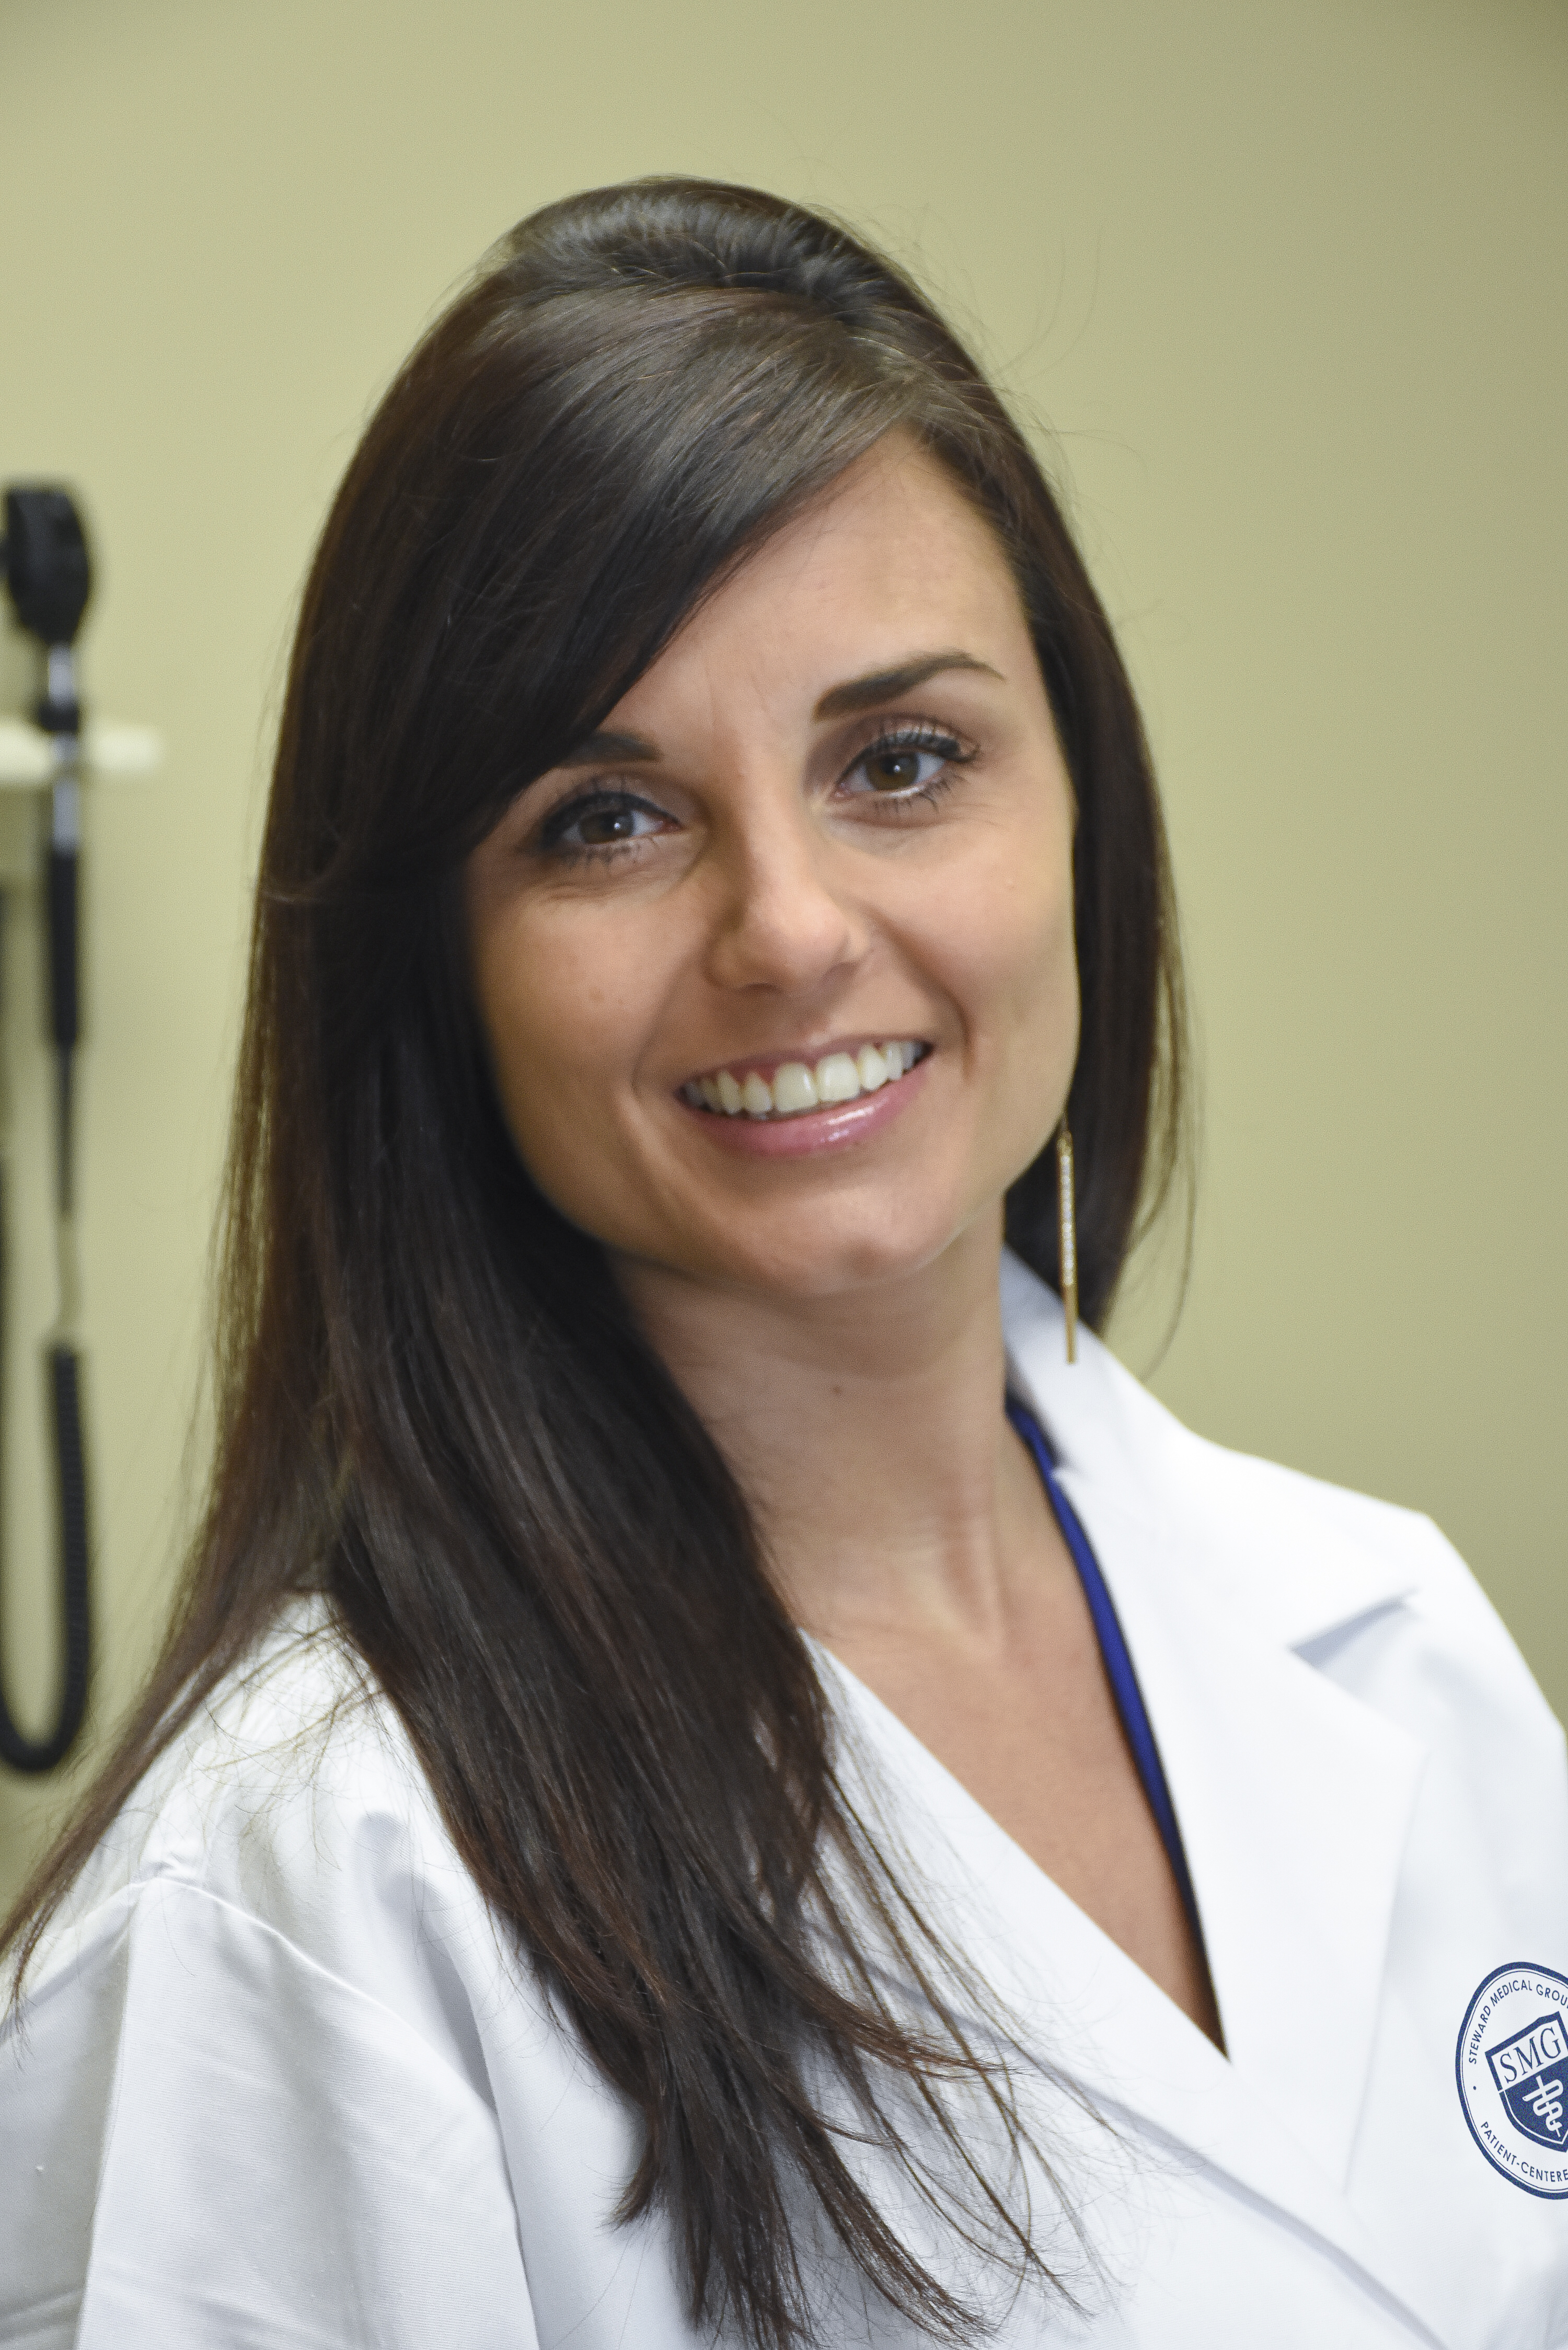 Amber Hicks-Thibodeau, MD